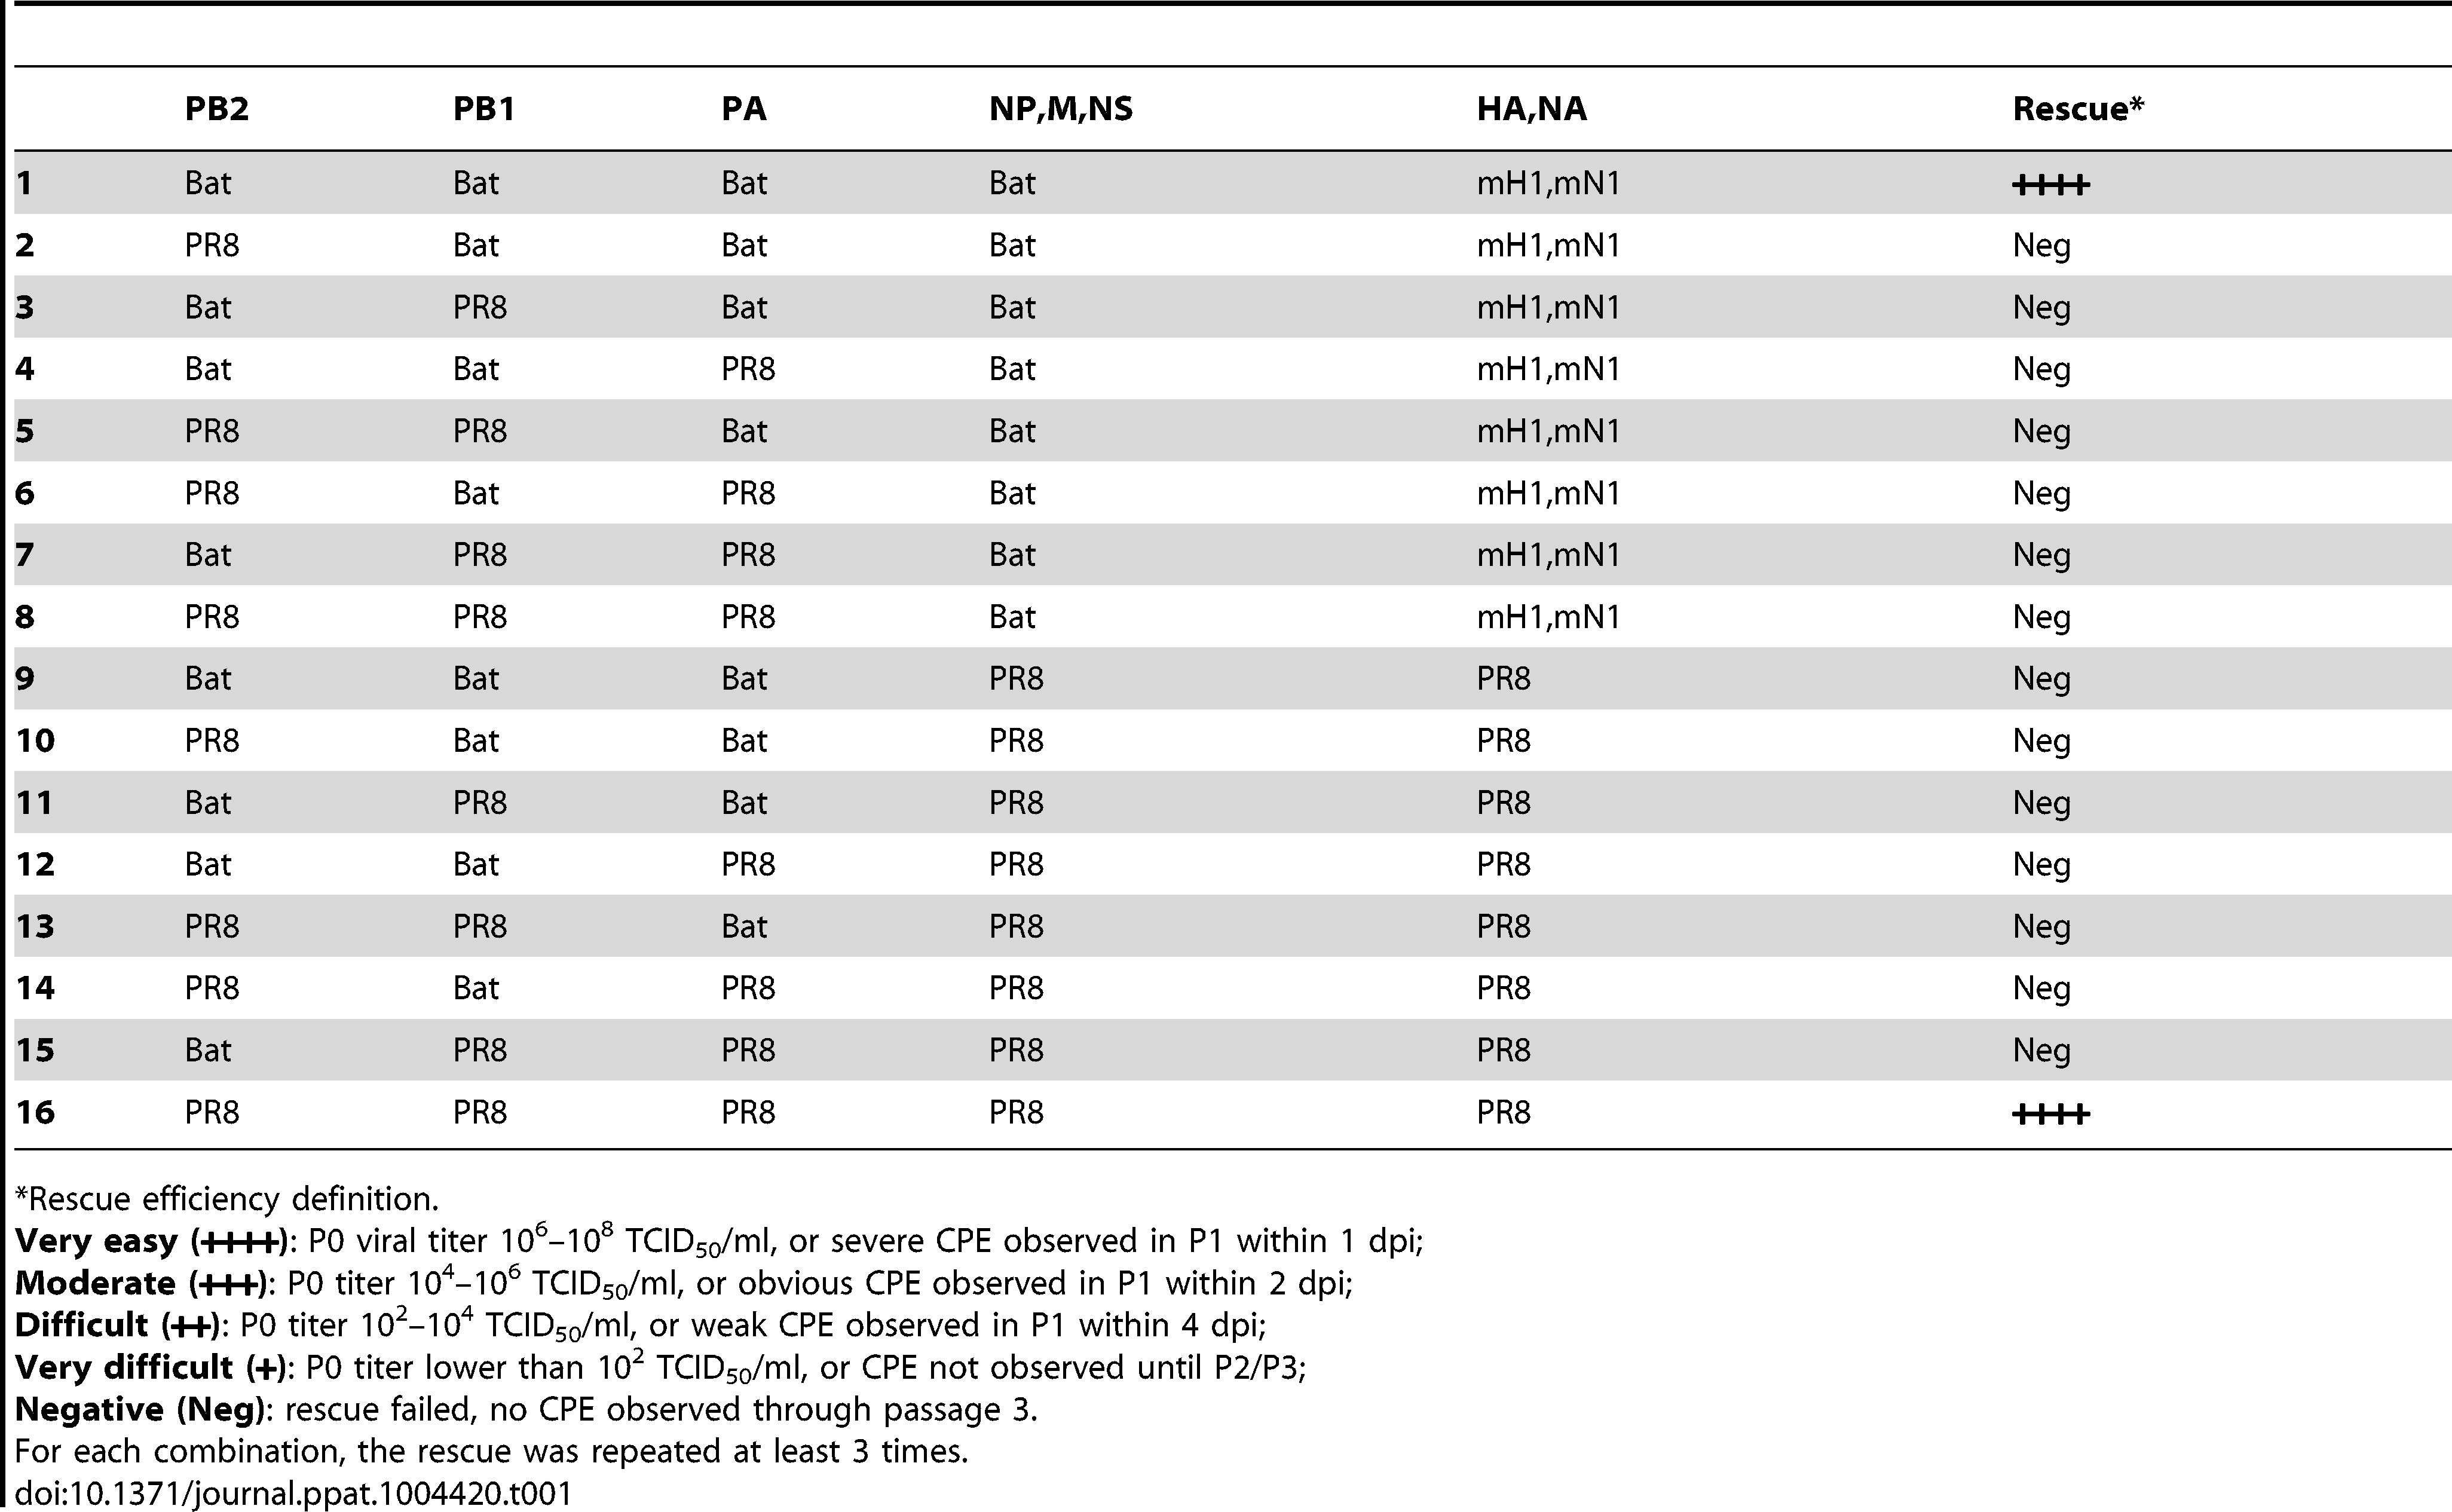 Rescue efficiency of PB2, PB1, PA reassortants between Bat09:mH1mN1 and PR8.